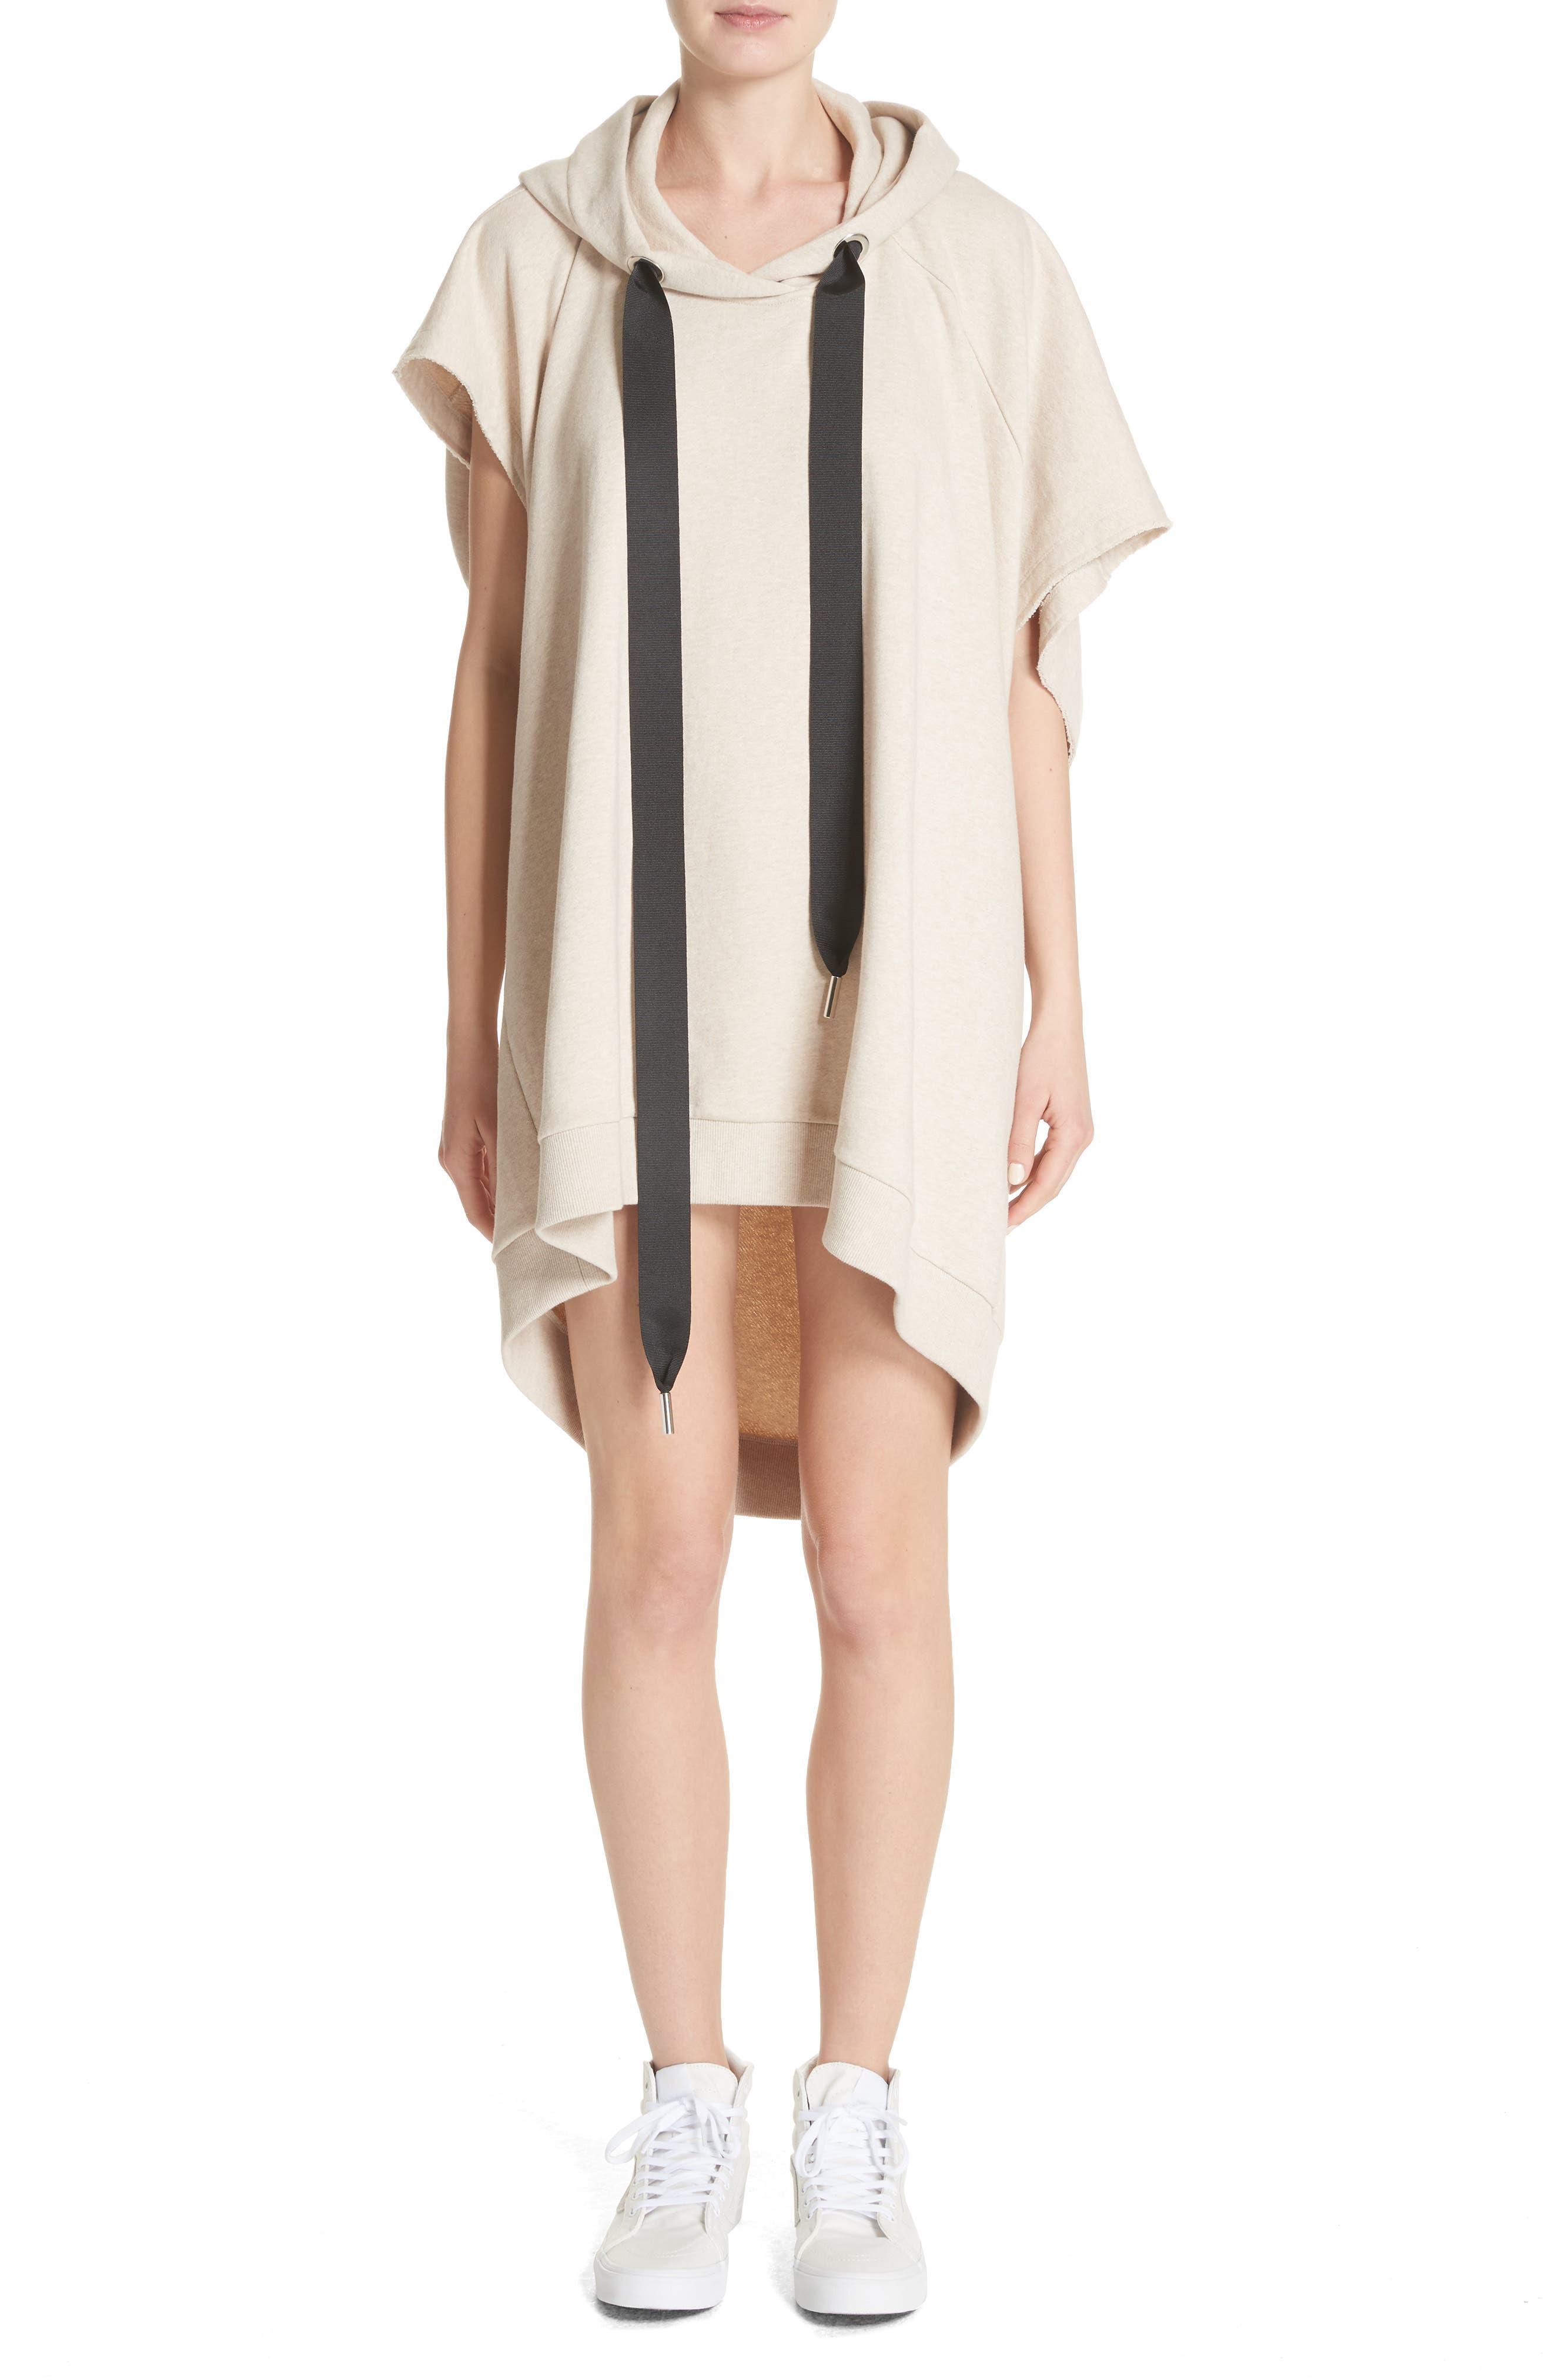 Marques'Almeida Asymmetrical Cap Sleeve Hoodie,                         Main,                         color, 250